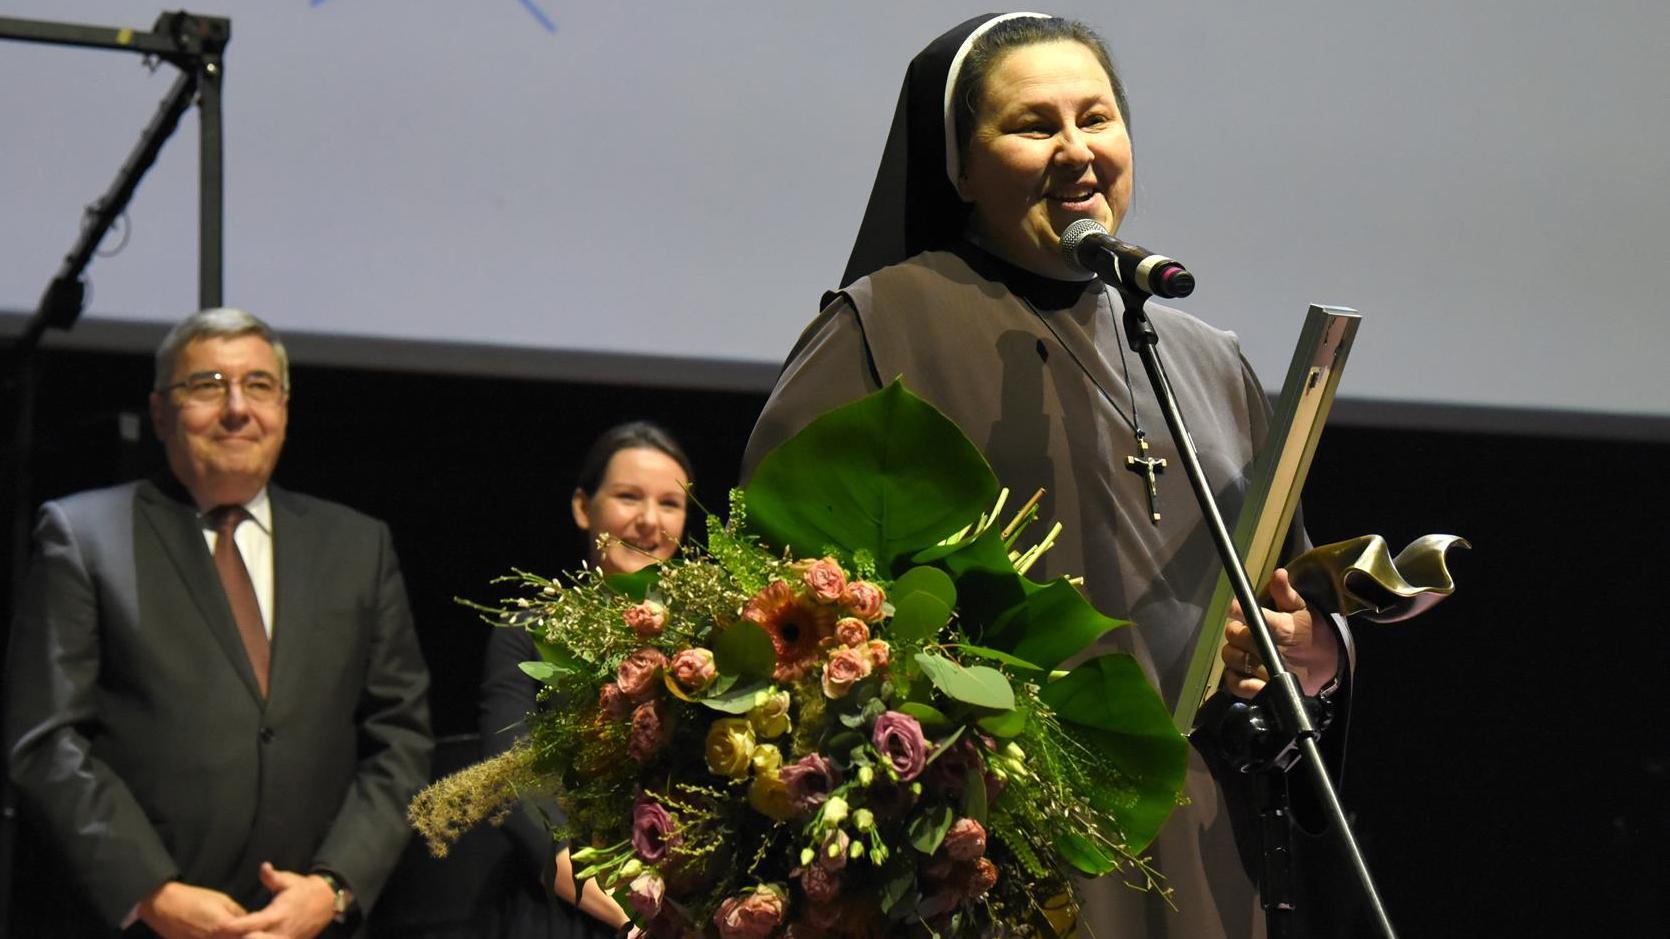 siostra barbara belchnerowska - poznan.pl